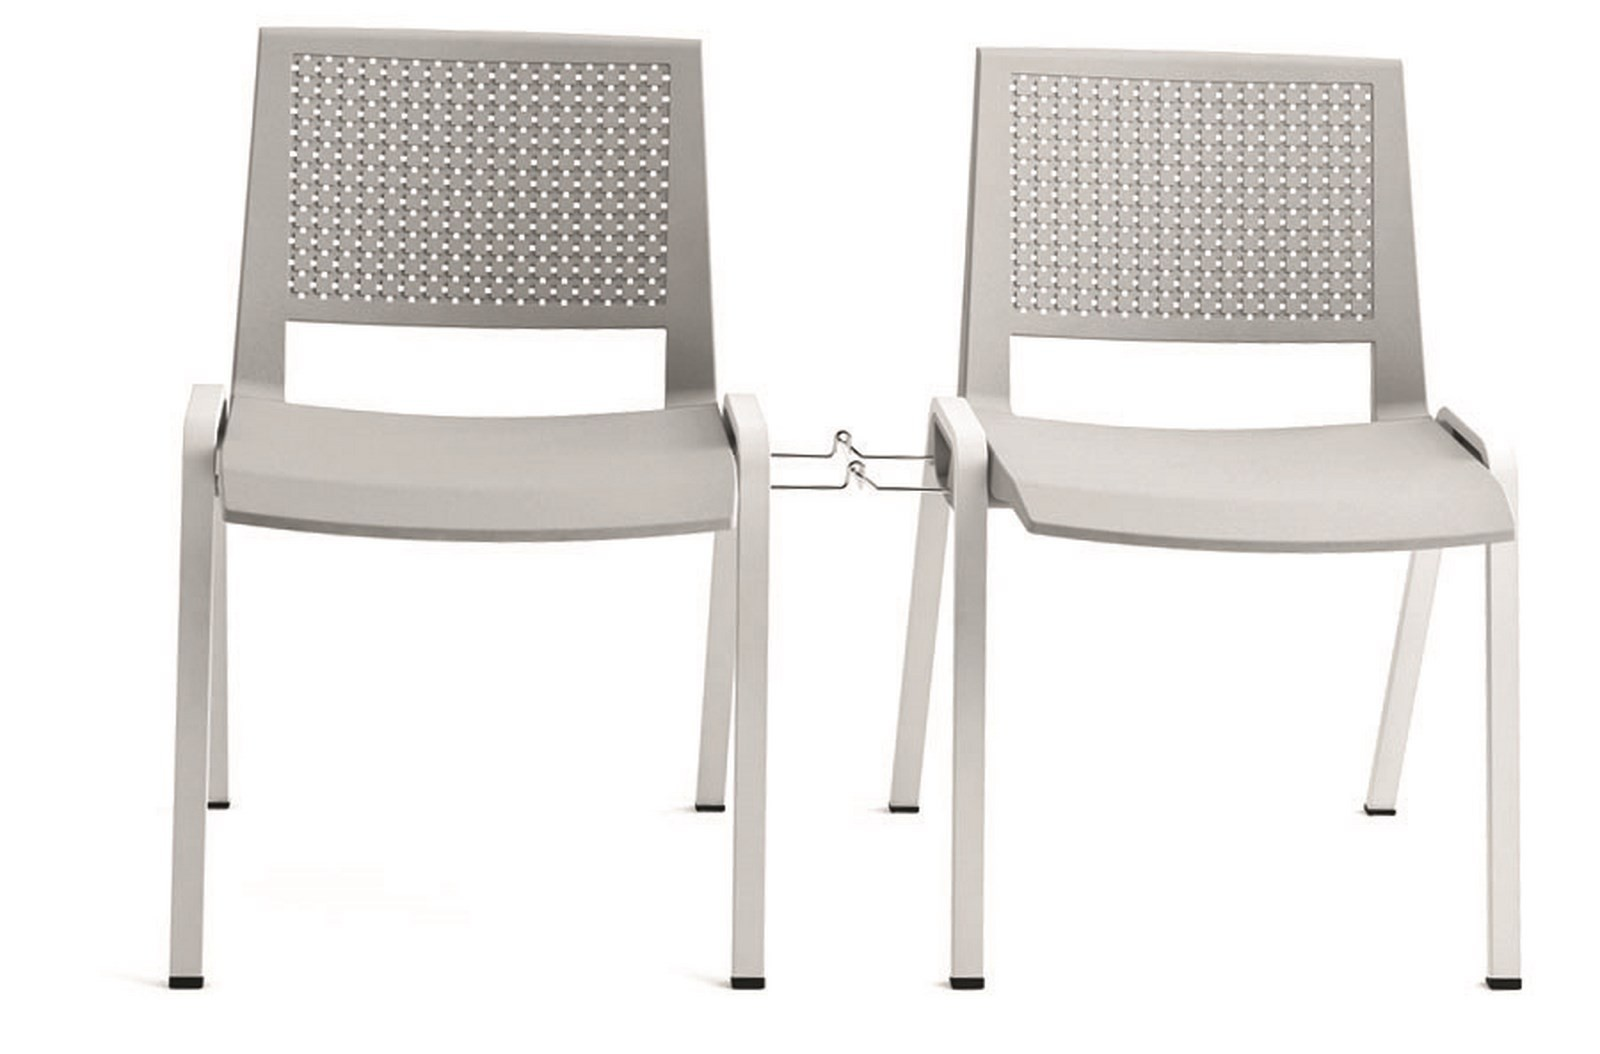 pi ce d 39 accroche pour chaise marna achat pi ce d 39 accroche 0 00. Black Bedroom Furniture Sets. Home Design Ideas